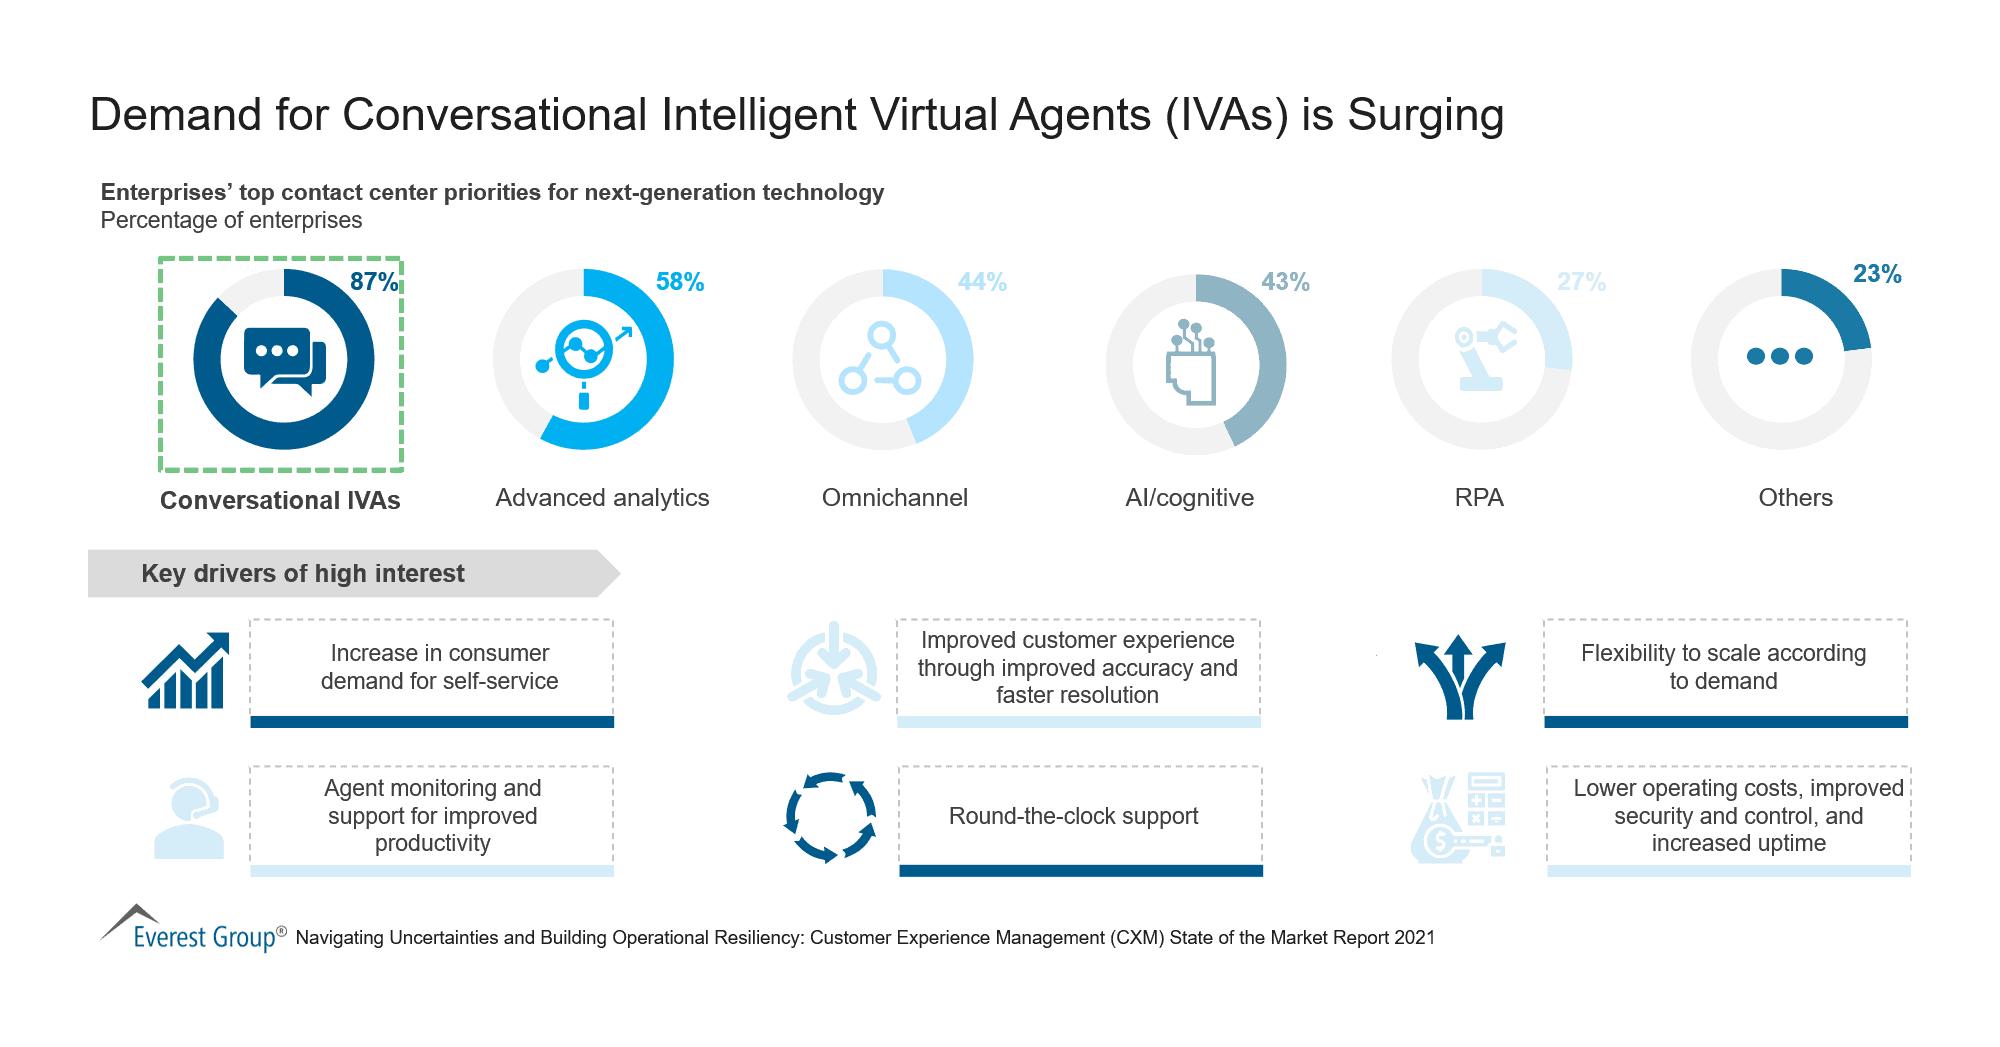 Demand for Conversational Intelligent Virtual Agents (AVIs) is Surging